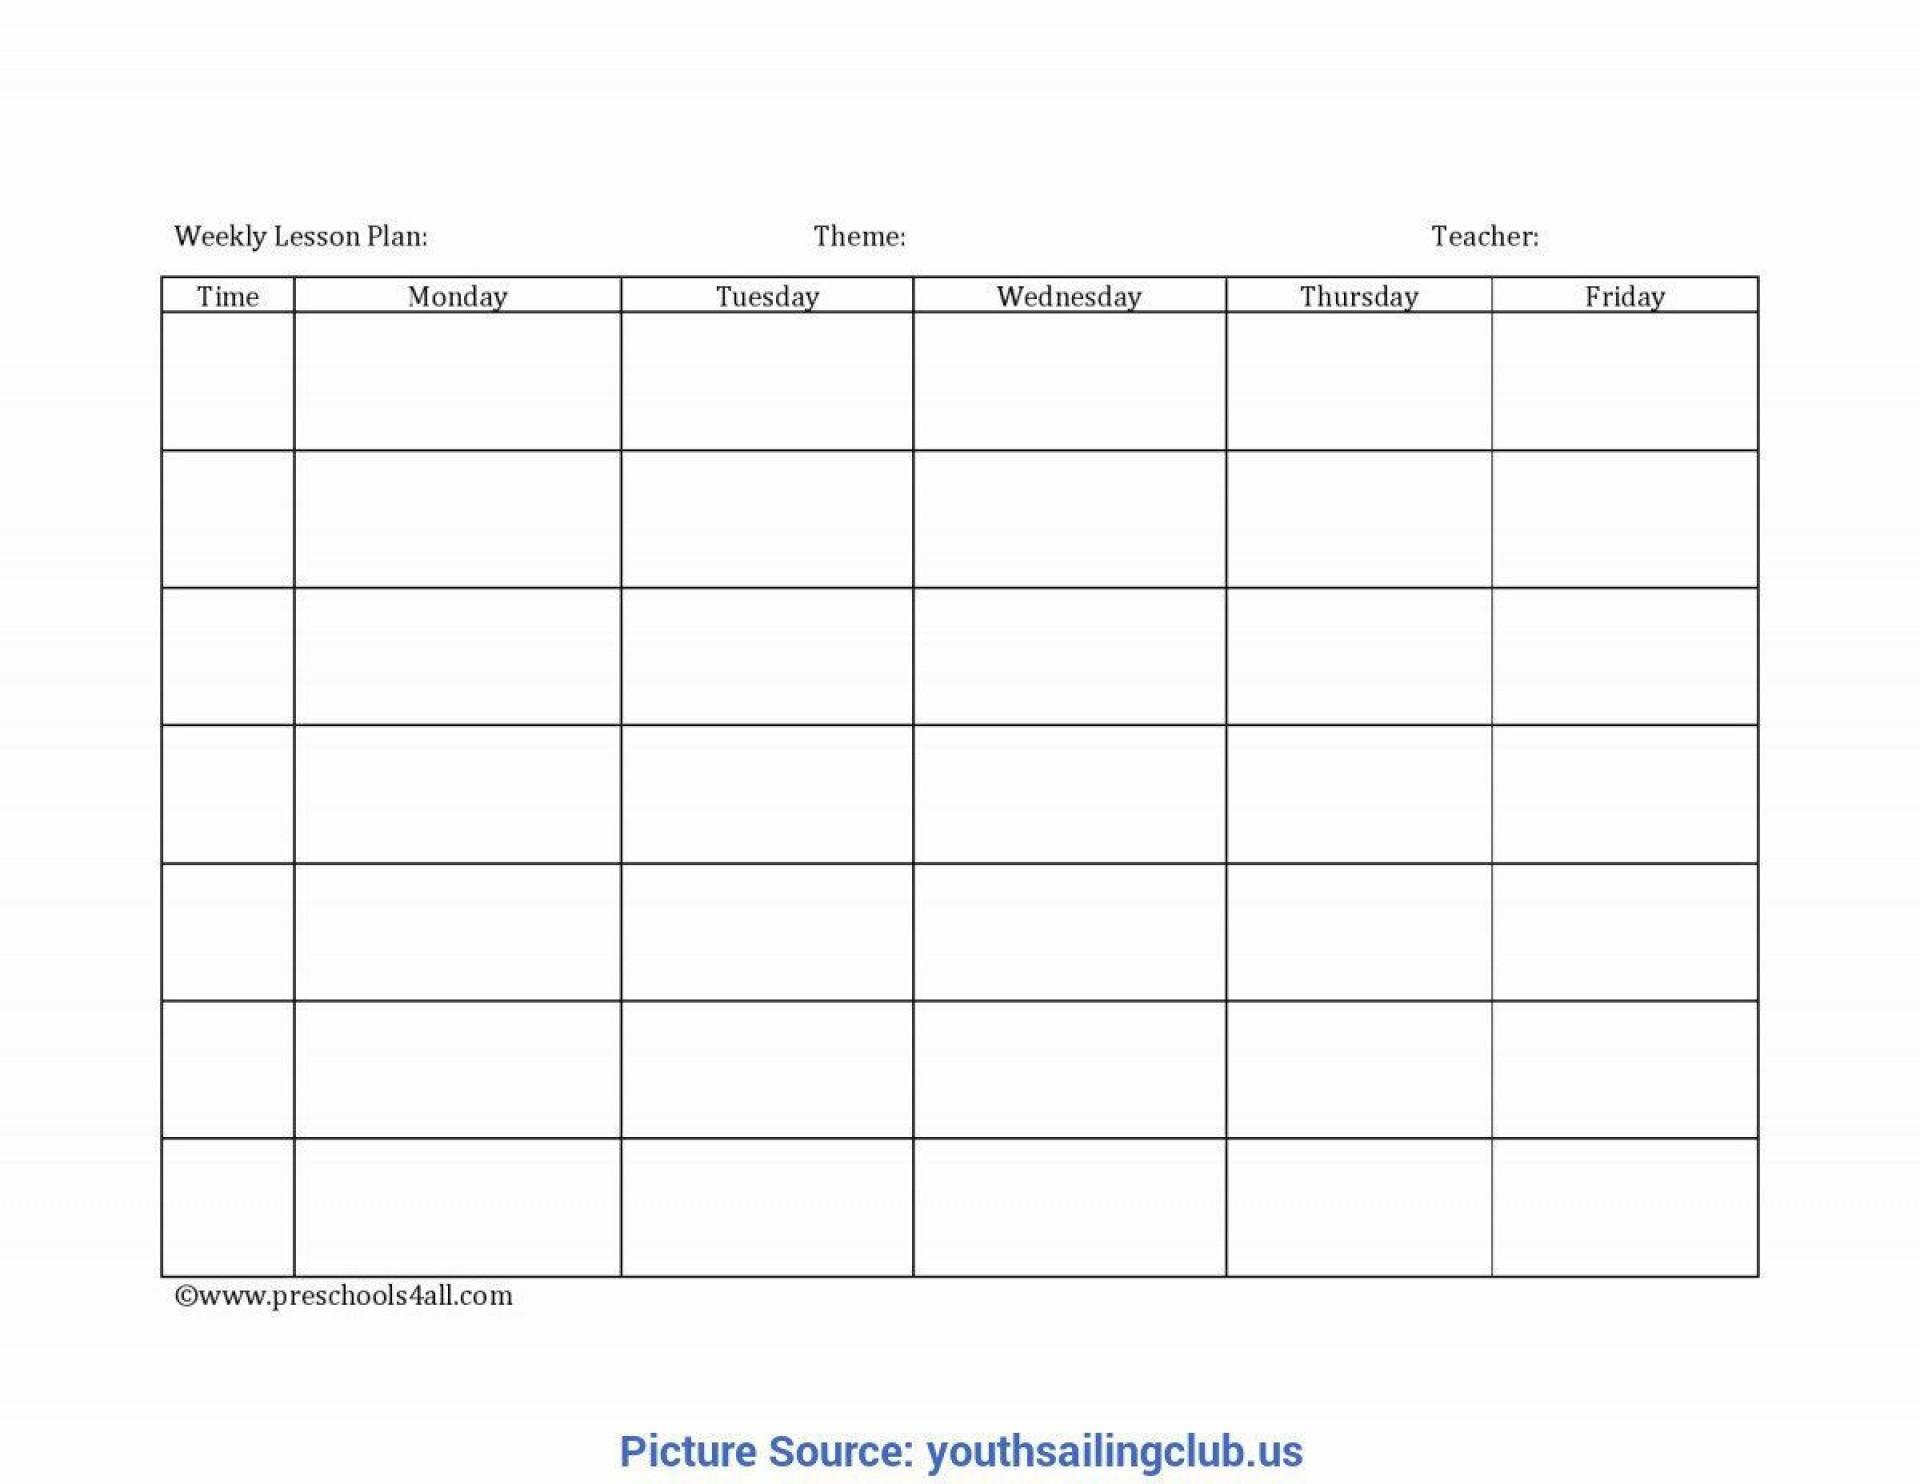 003 Unbelievable Preschool Lesson Plan Template Image  Editable With Objective Pre-k Printable1920